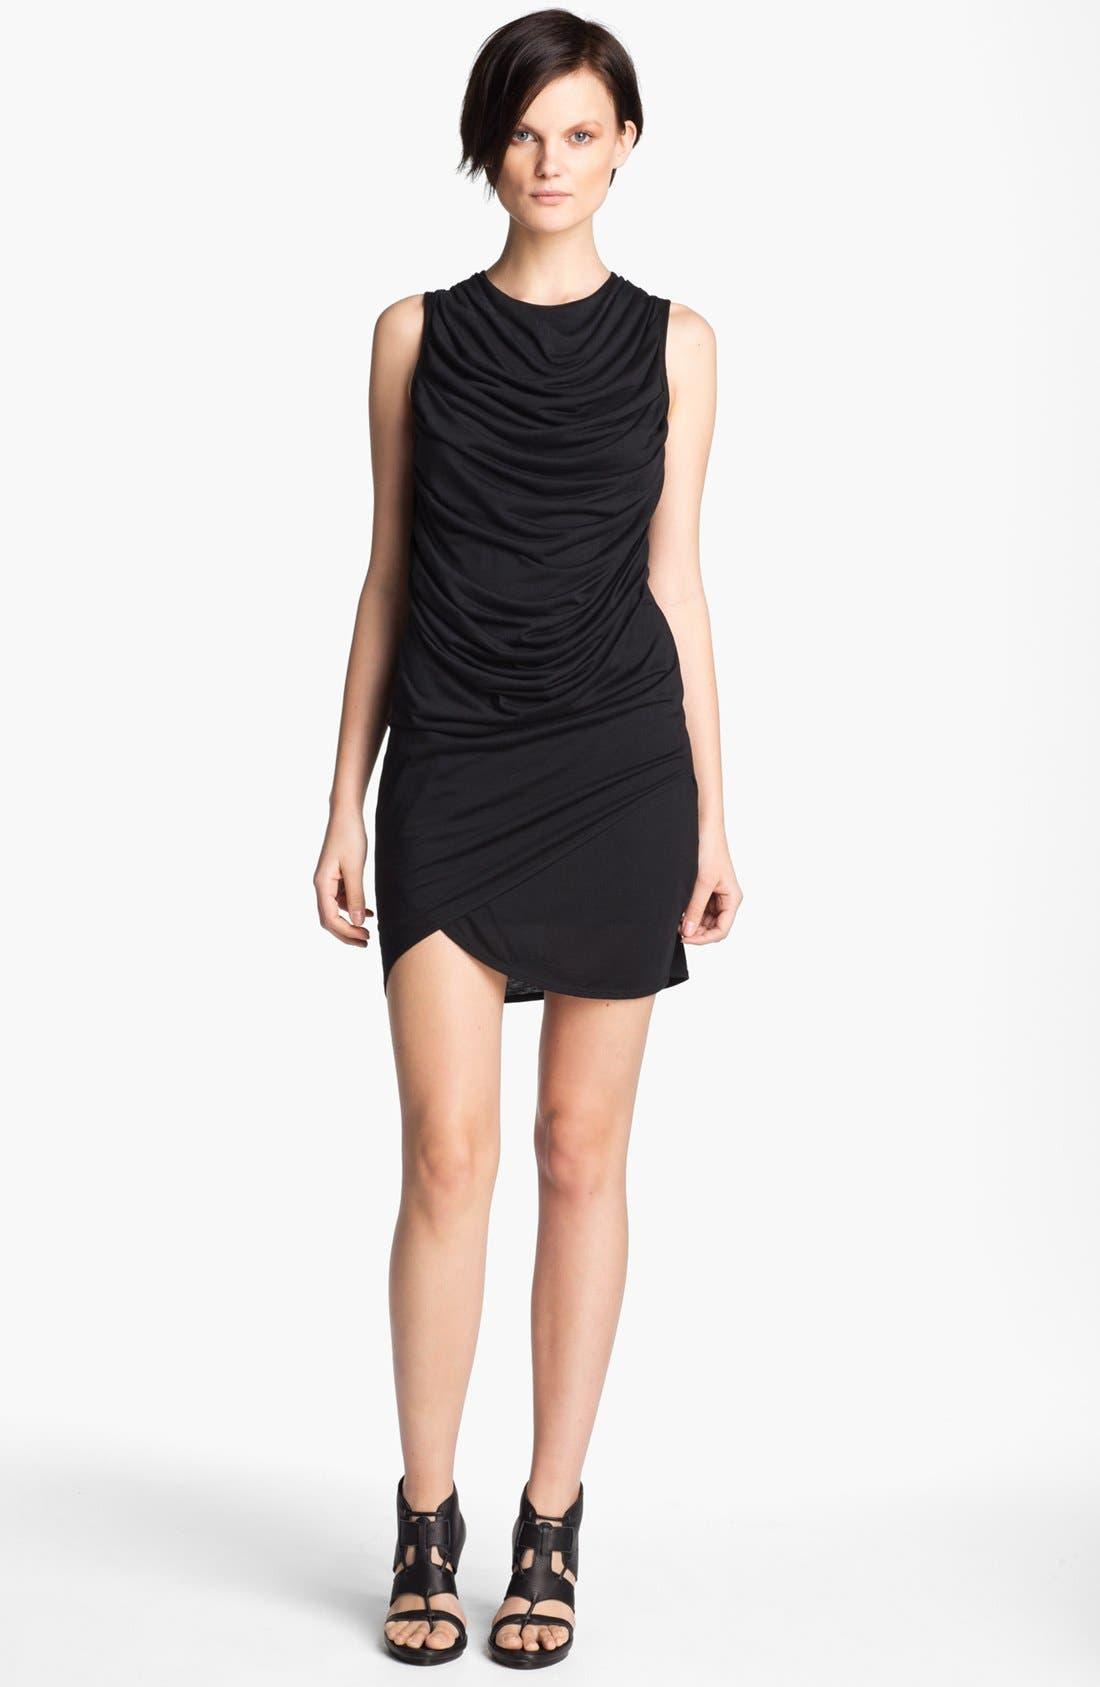 Alternate Image 1 Selected - HELMUT Helmut Lang 'Kinetic' Draped Jersey Dress